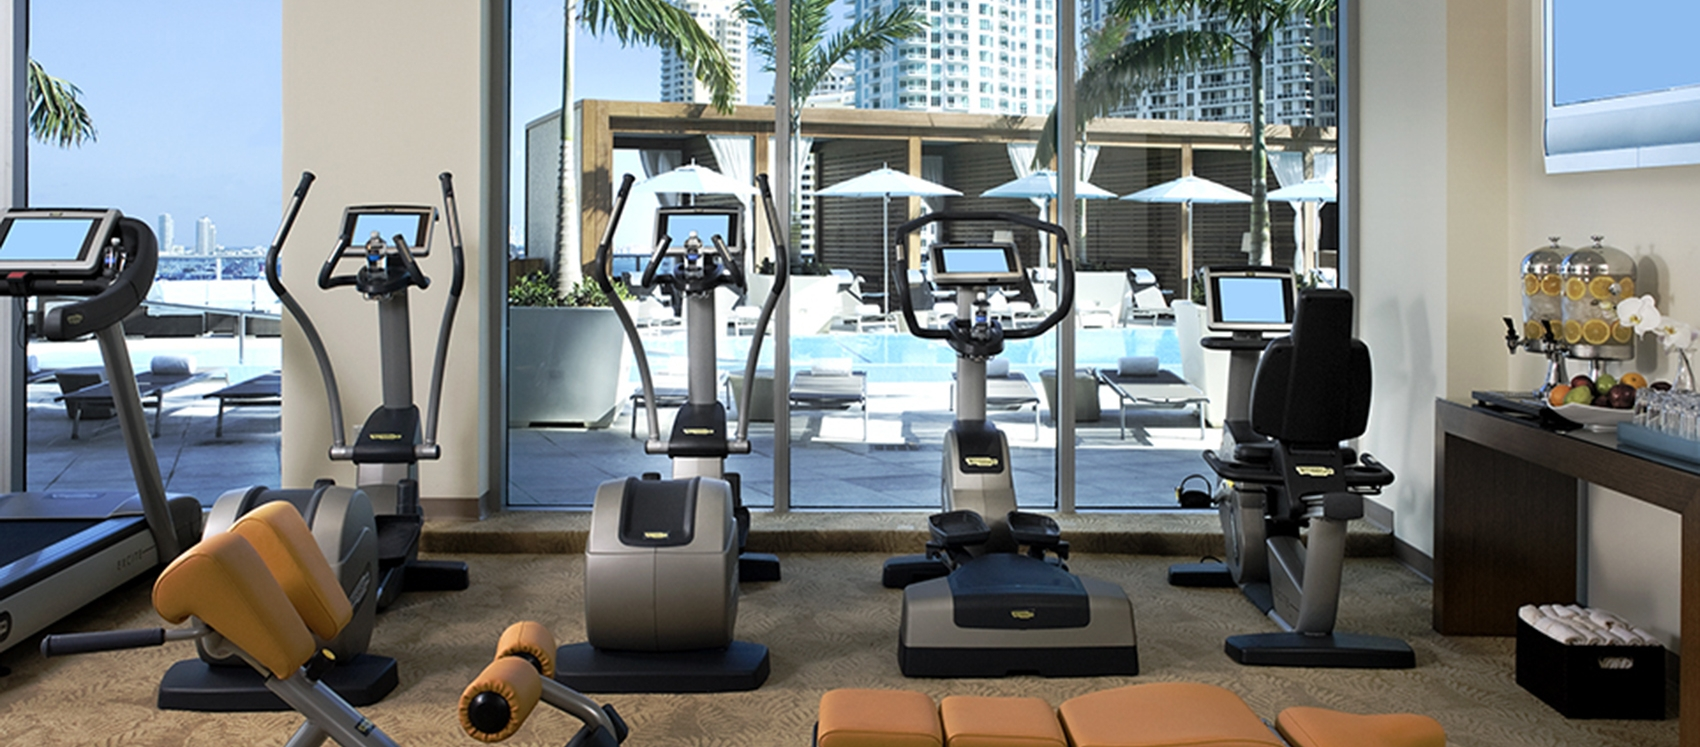 fitness-center-0f744573.jpg